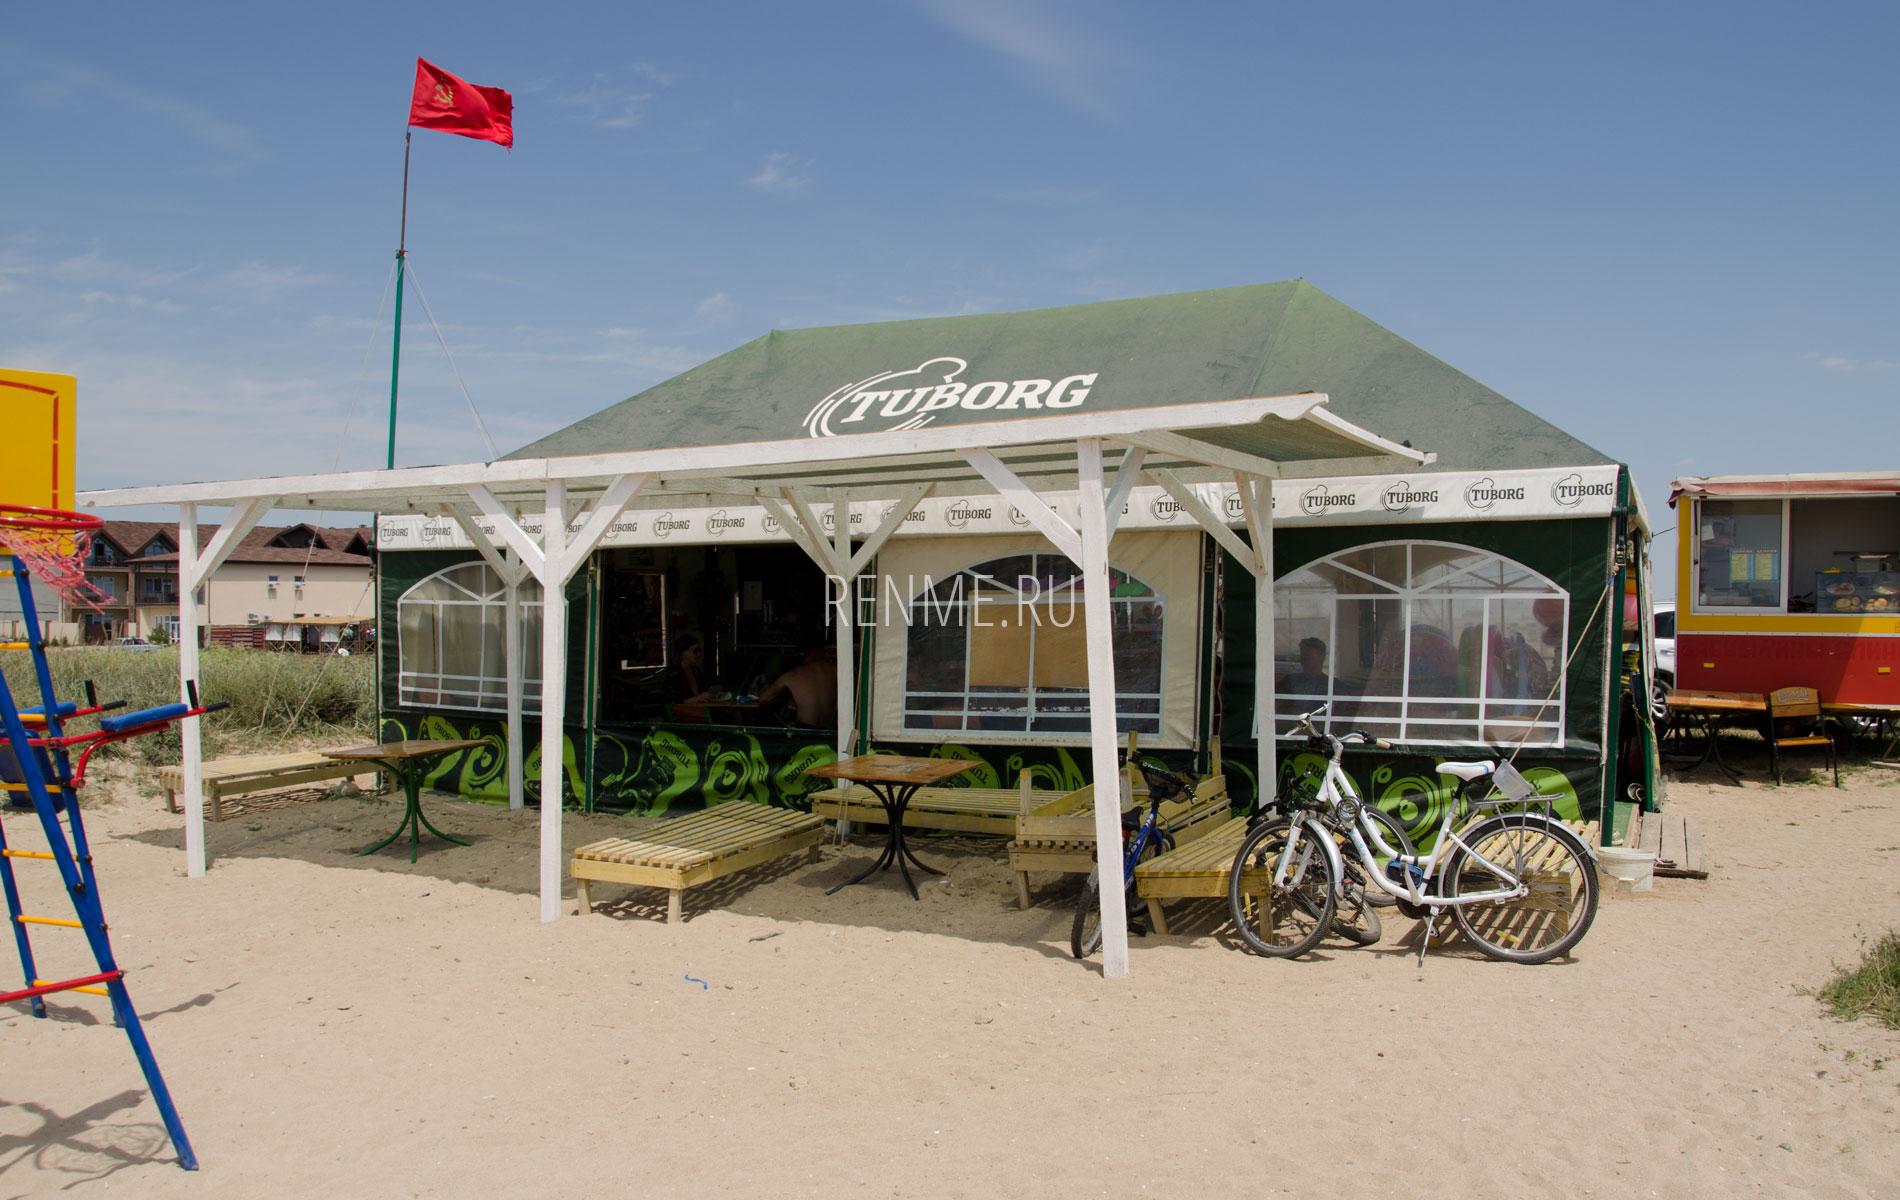 Кафе на пляже Песчанка летом 2019. Фото Заозёрного